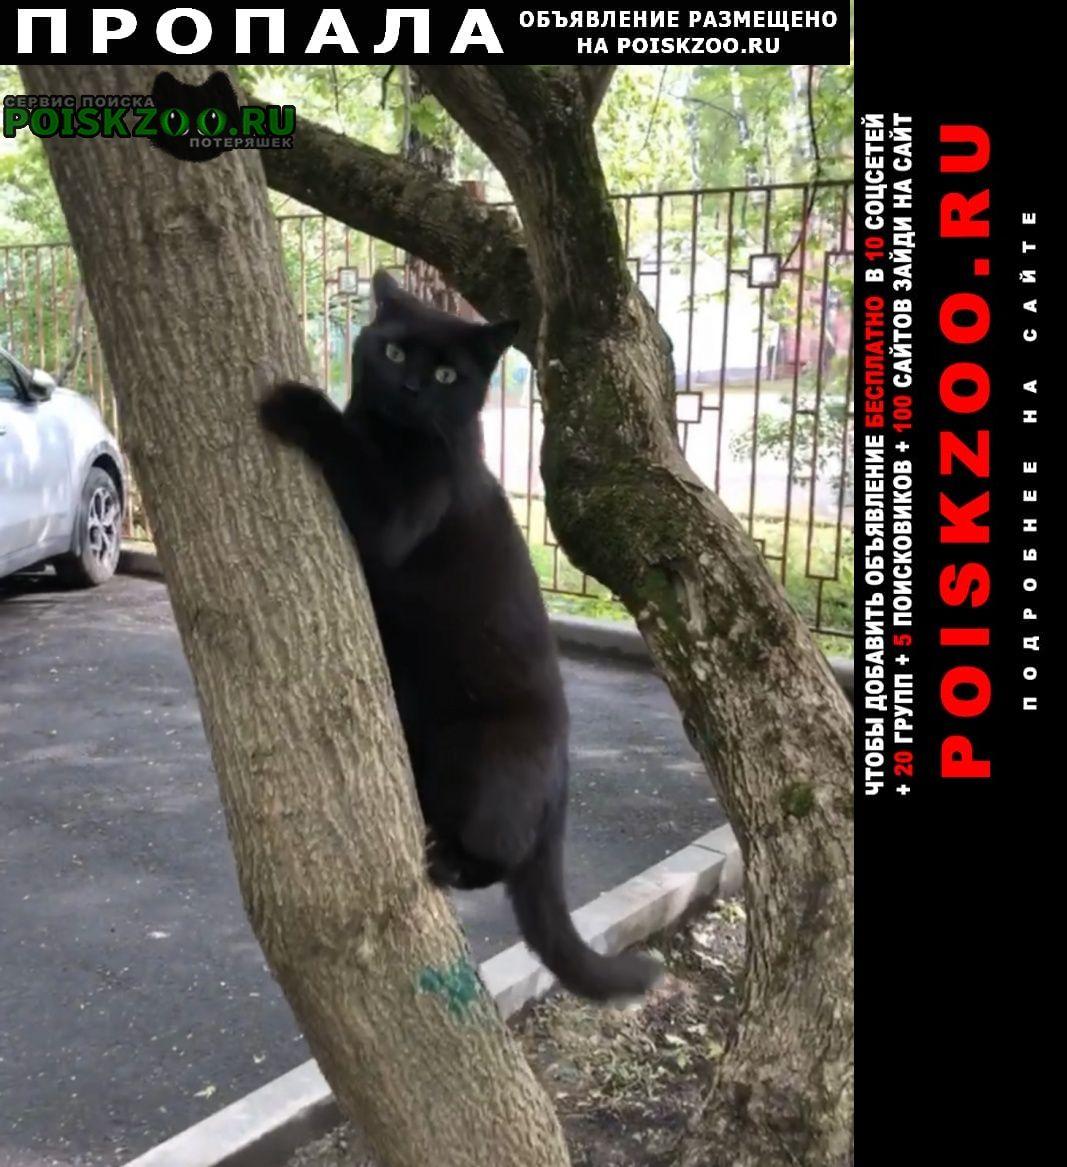 Пропала кошка чёрная Москва